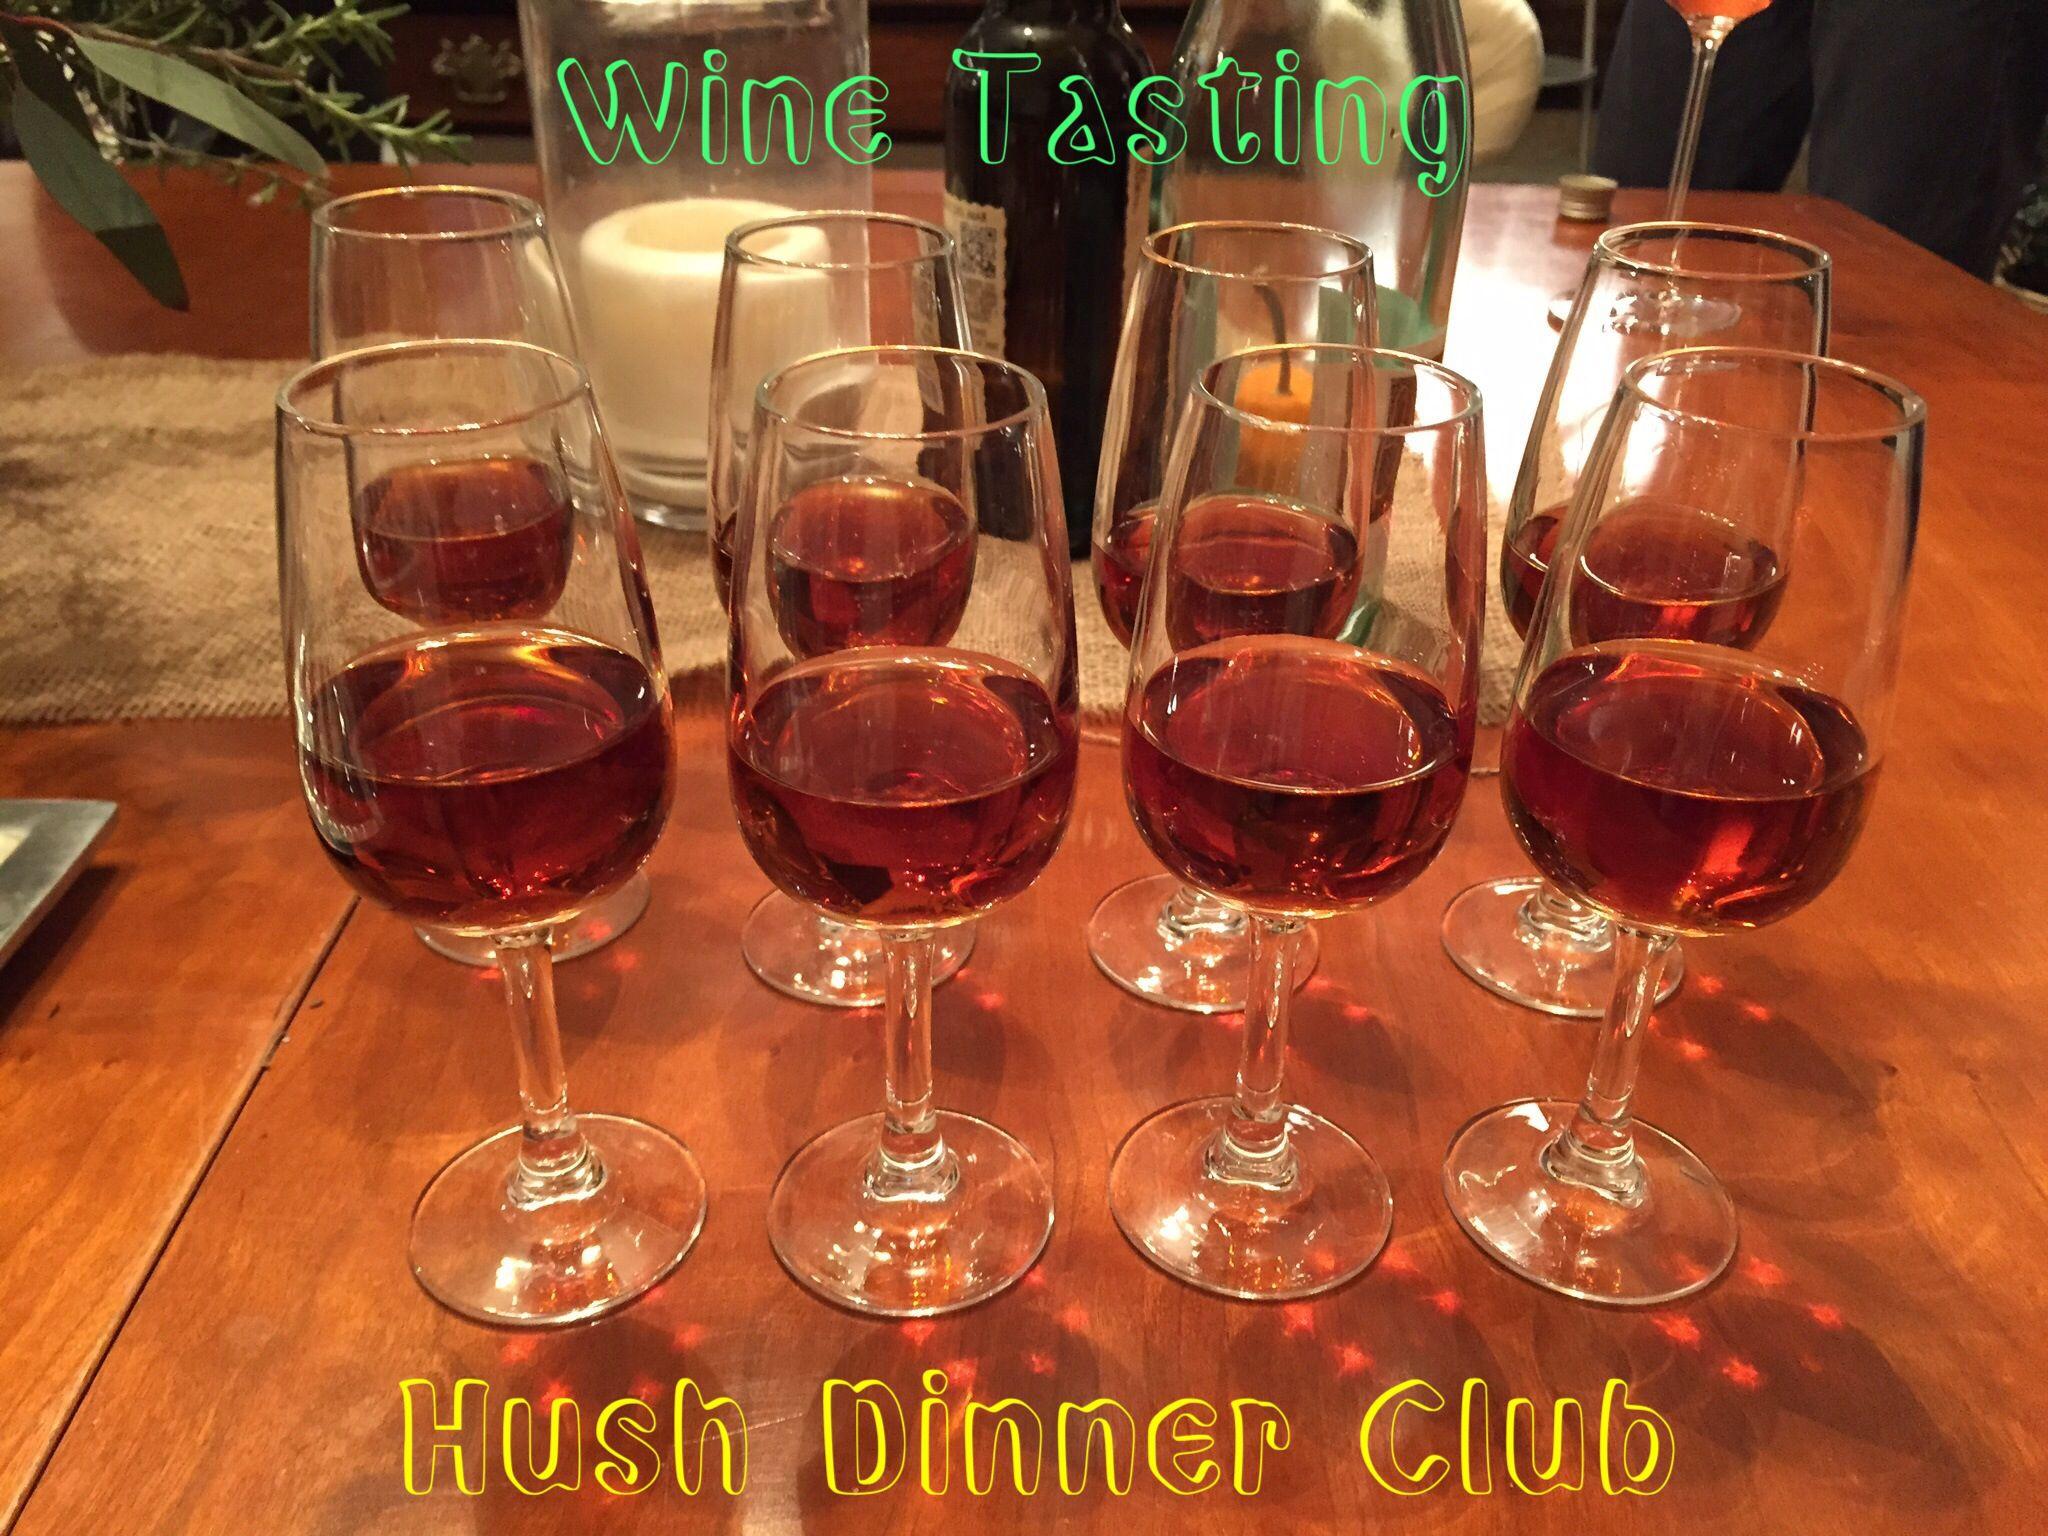 Wine Tasting With The Hush Dinner Club Dinner Club Wine Tasting Wine